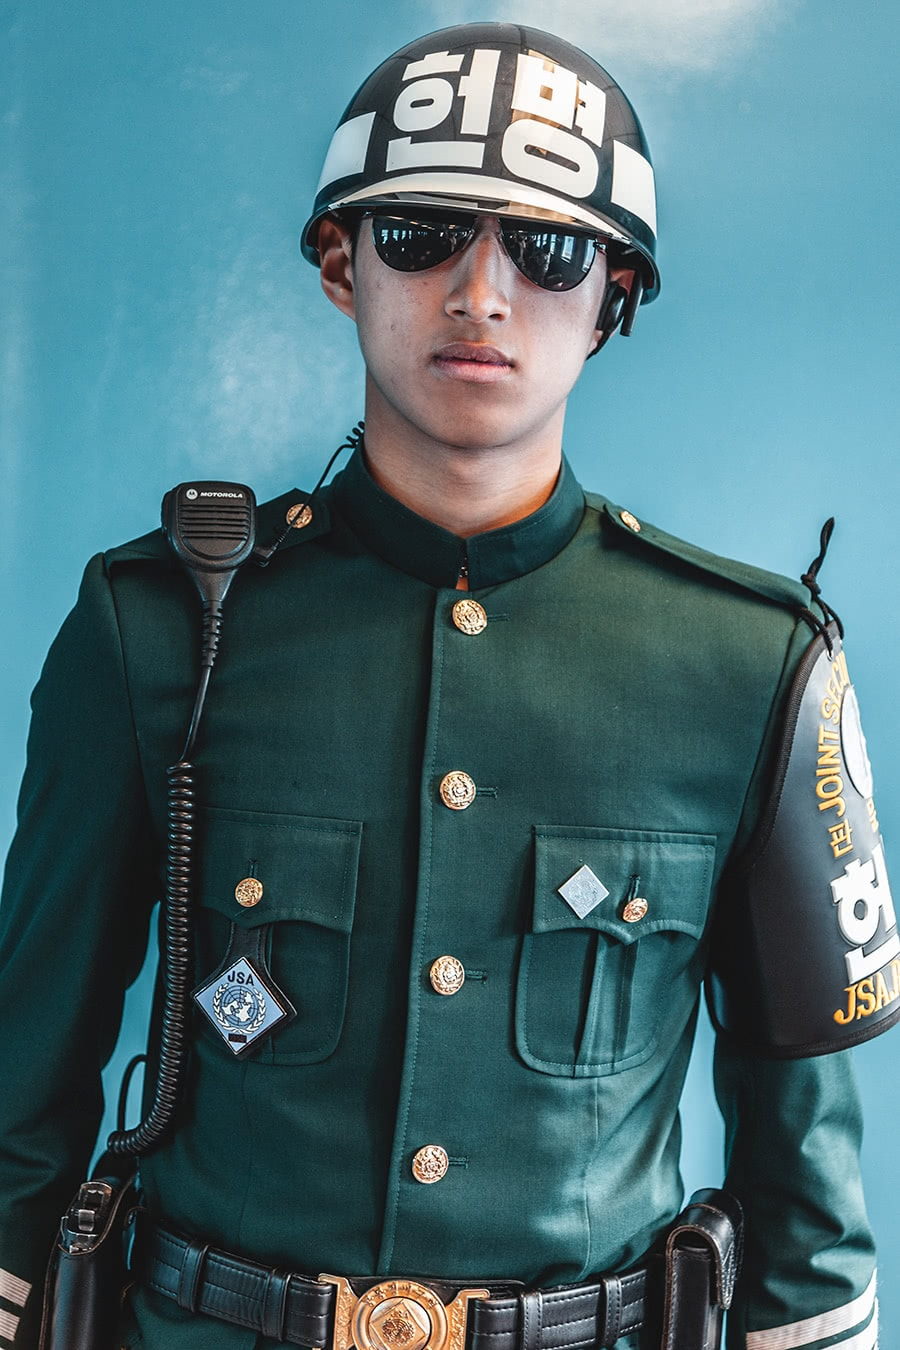 South Korean border guard at the DMZ, Panmunjom, South Korea.